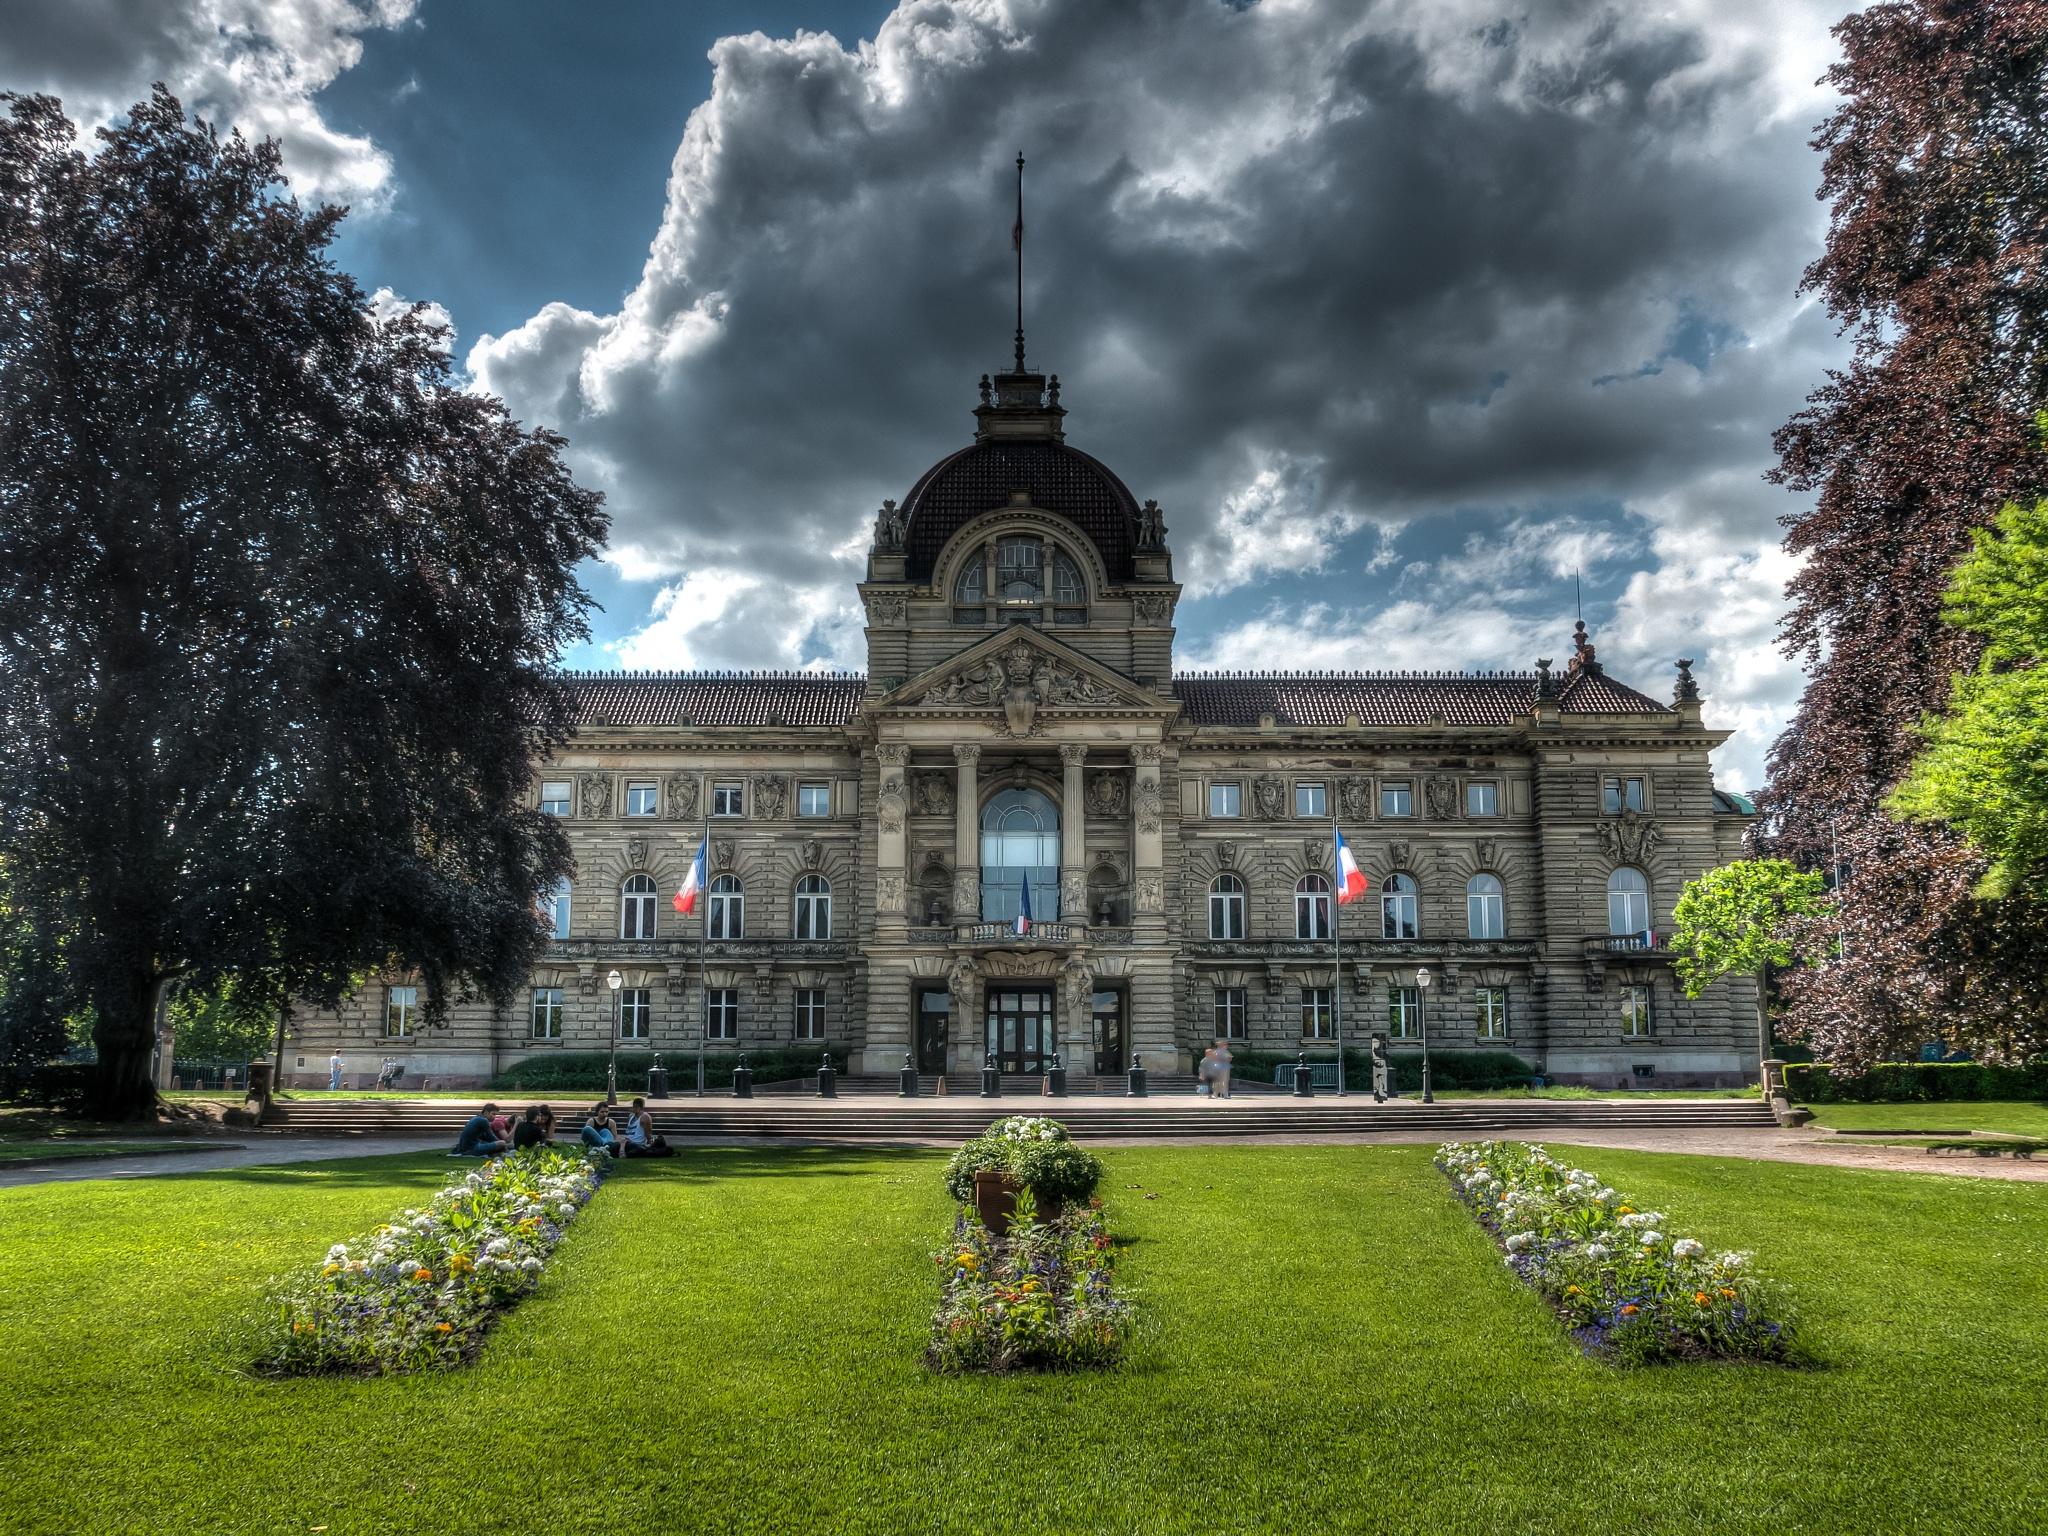 Photo in Architecture #france #strasbourg #palais du rhin #place de la republic #clouds #hdr #architecture #city #palace #sunny #cloudy #garden #flowers #green #german #german quarter #rhin